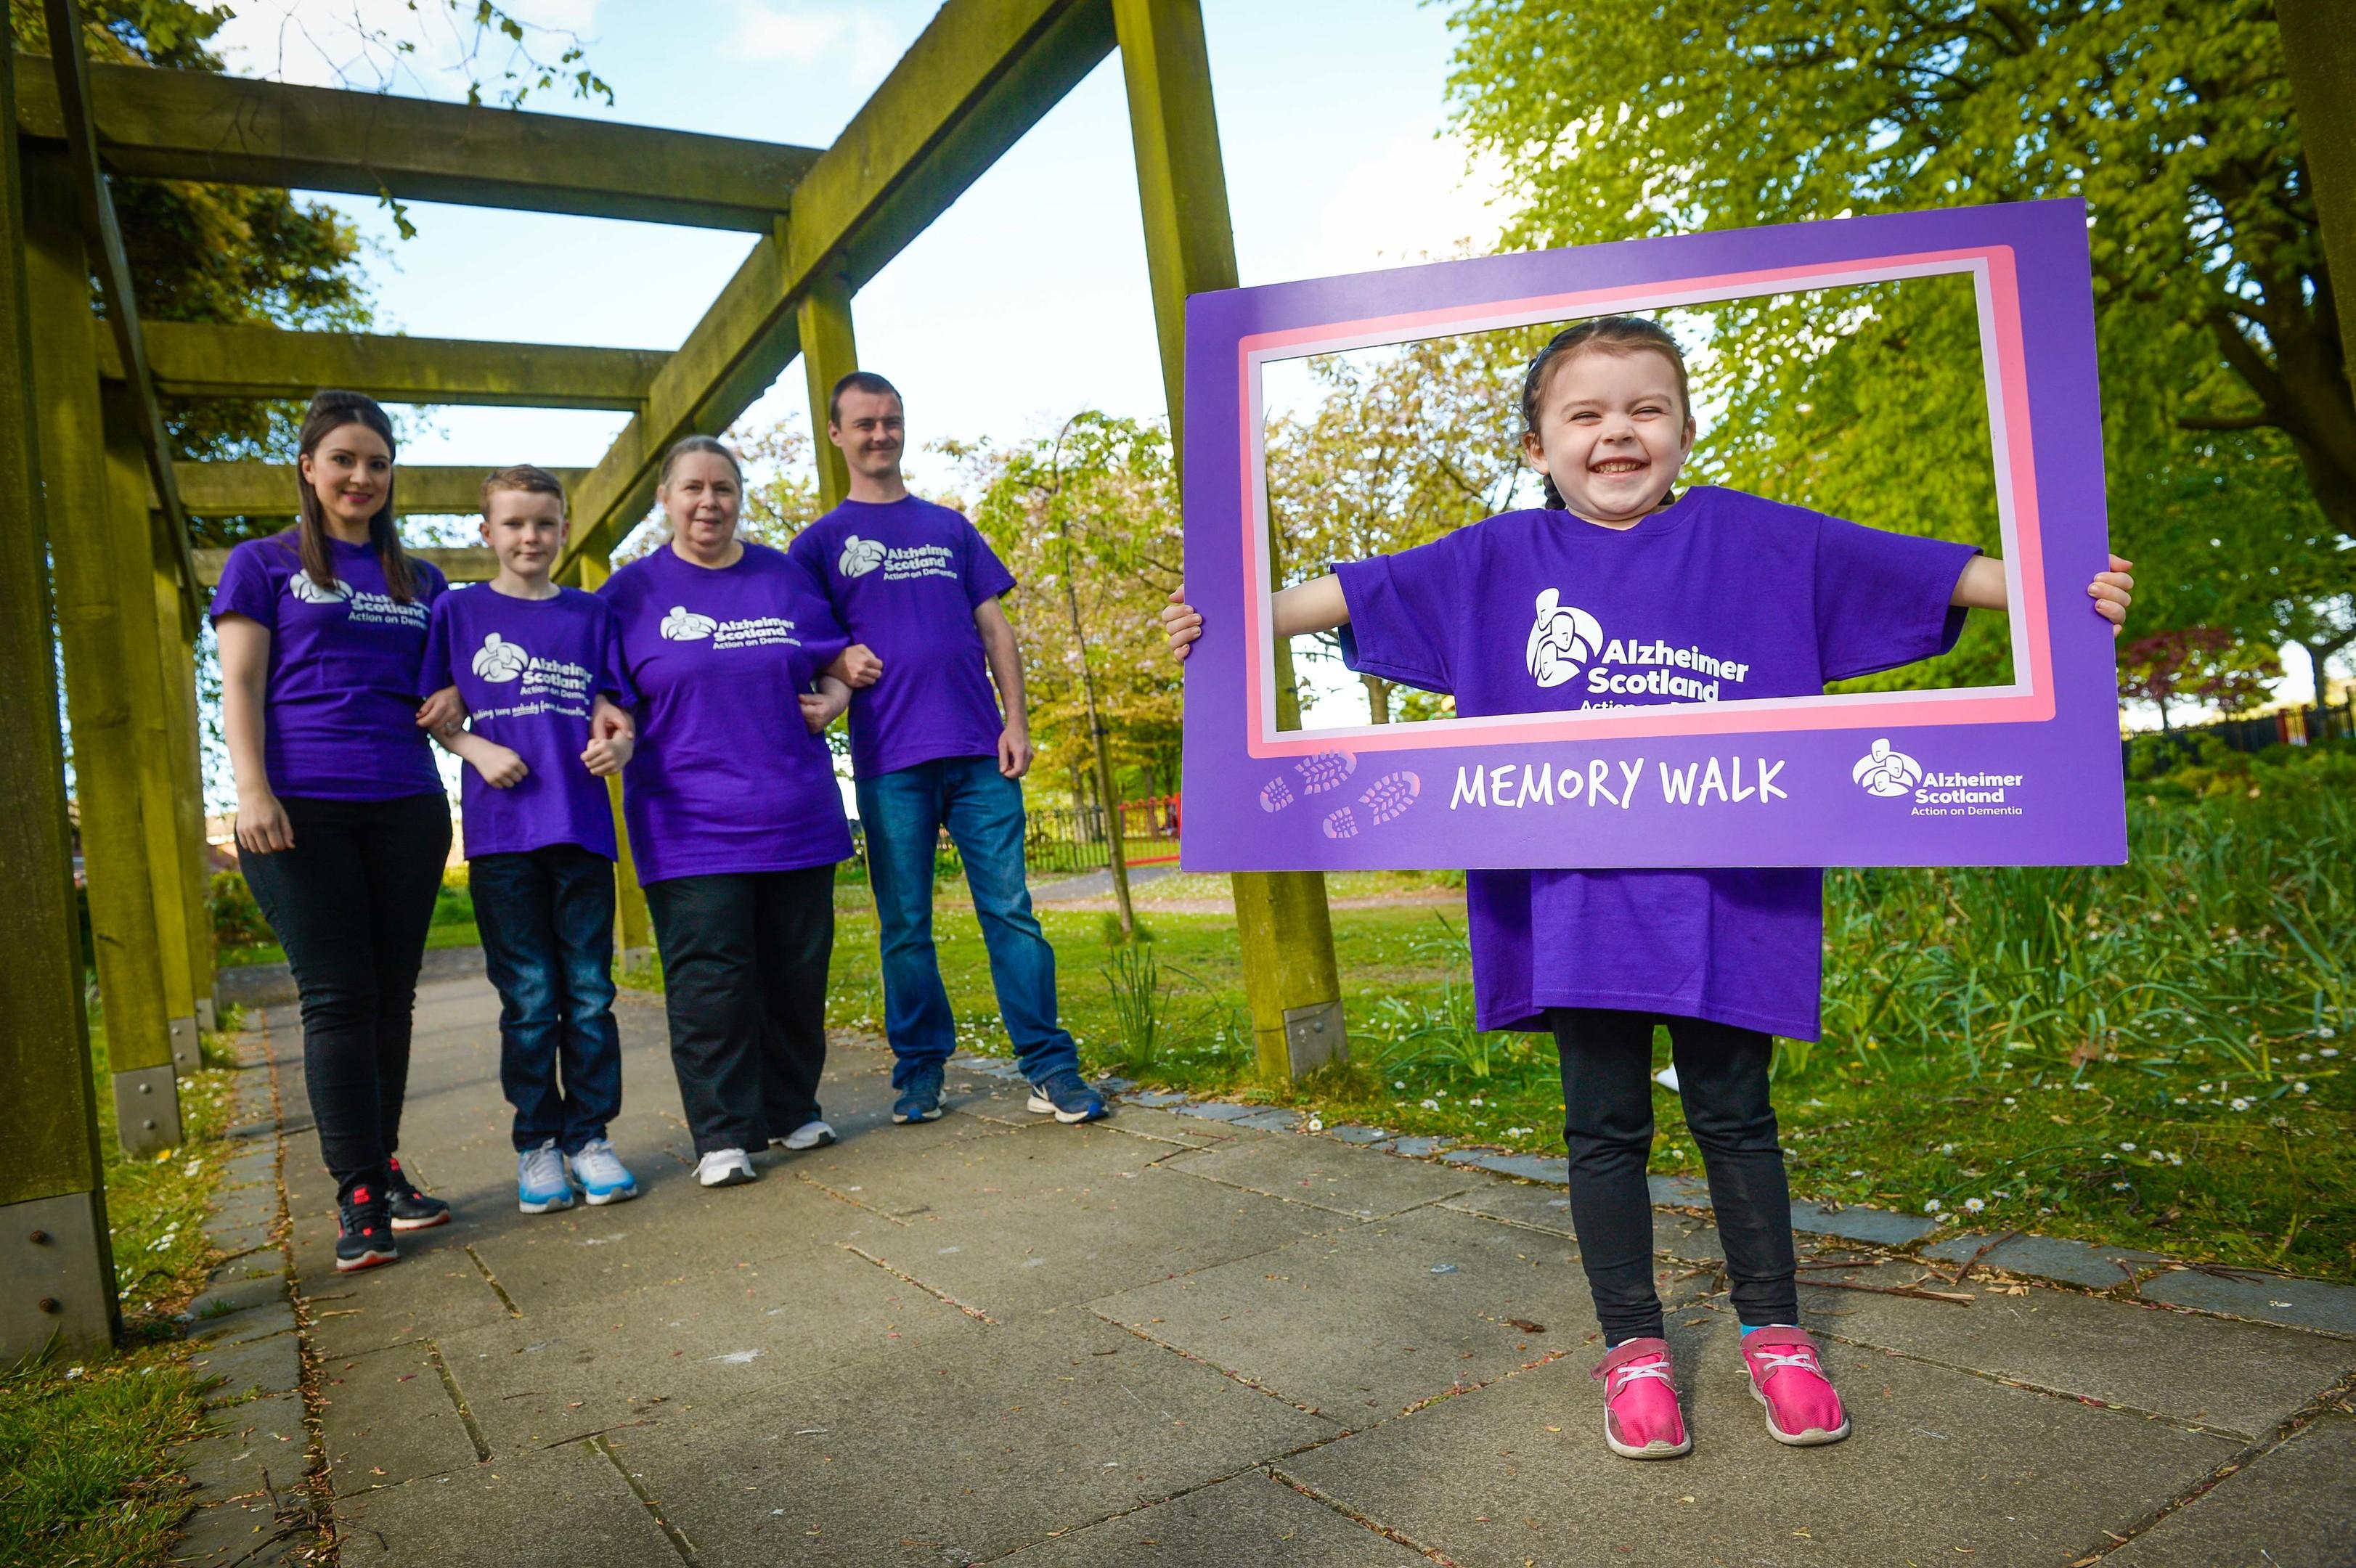 Alzheimer Scotland Memory Walks (Nick Ponty)